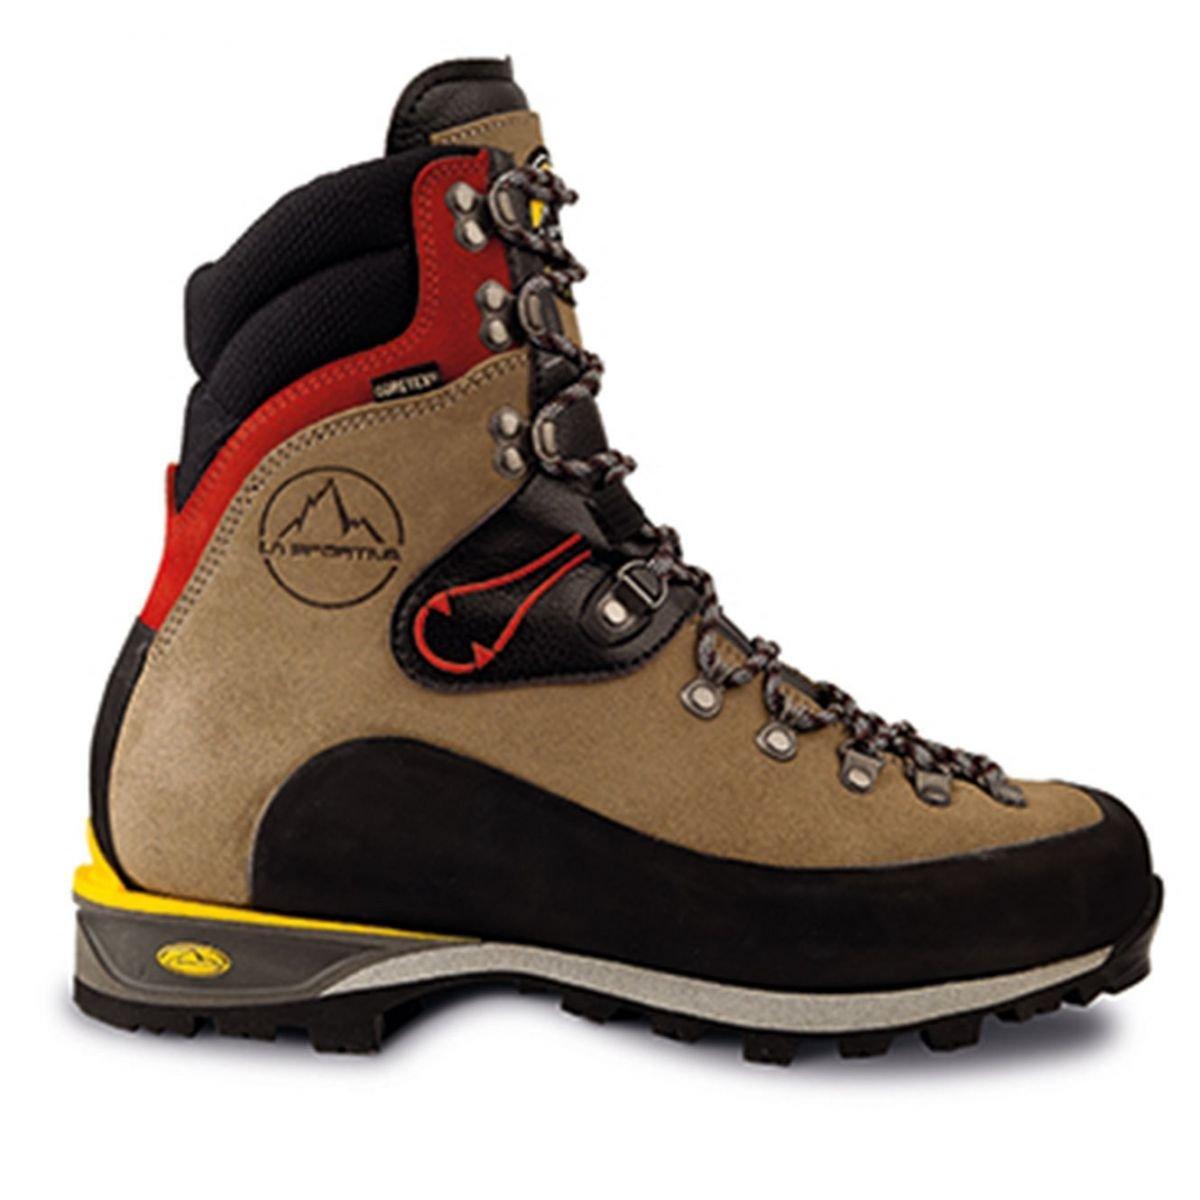 La Sportiva Unisex-Erwachsene 11fsr Trekking-& Wanderstiefel